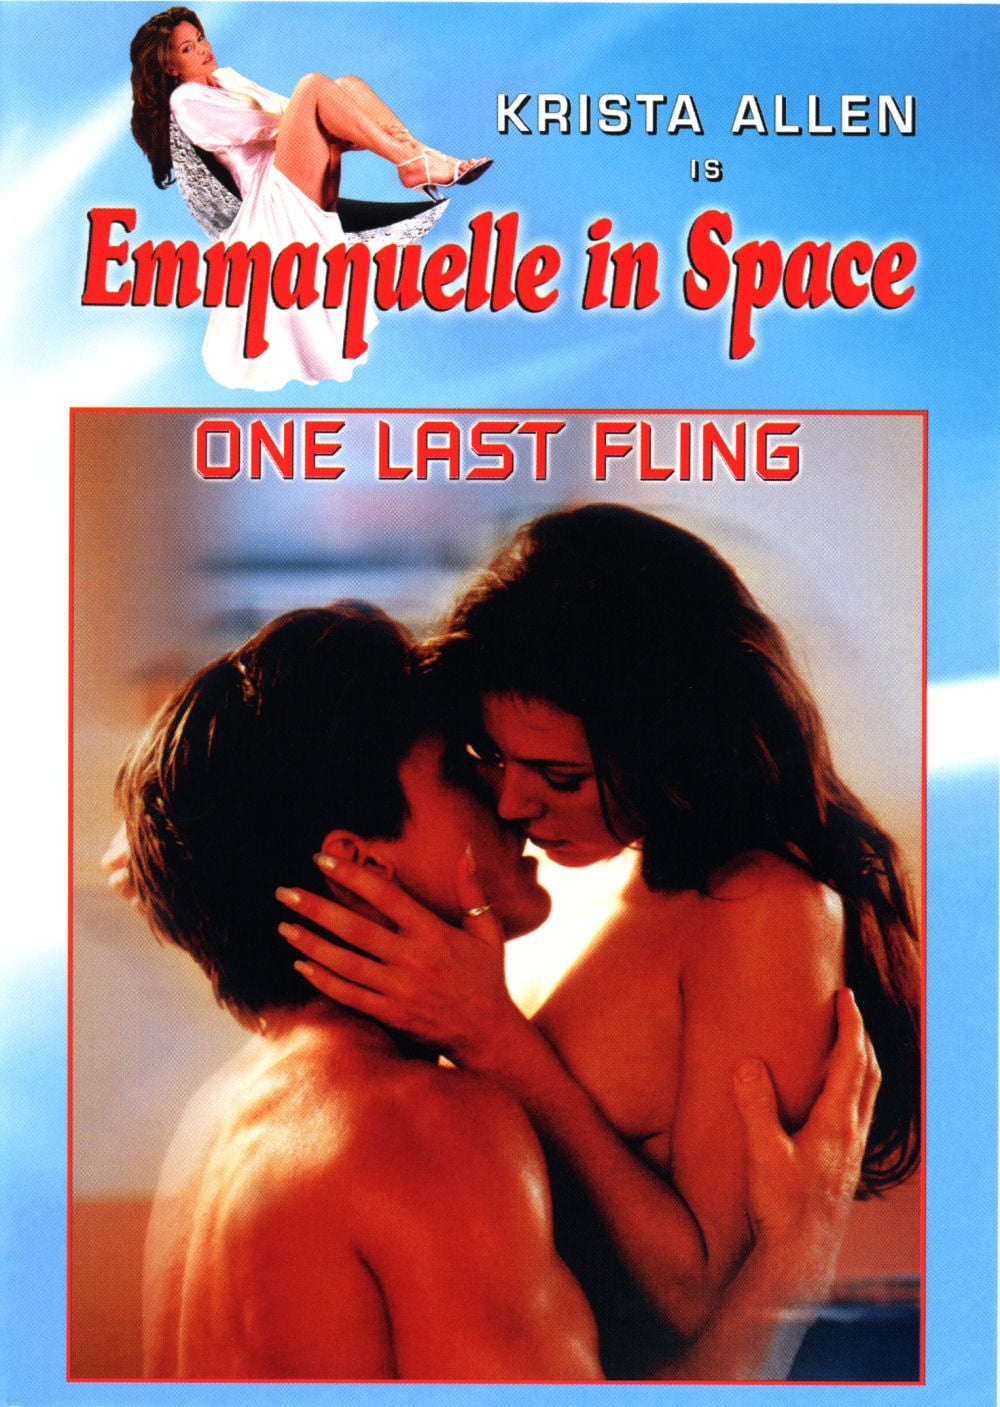 Emmanuelle in Space 6: One Last Fling (1994) DVDRip x264 425MB